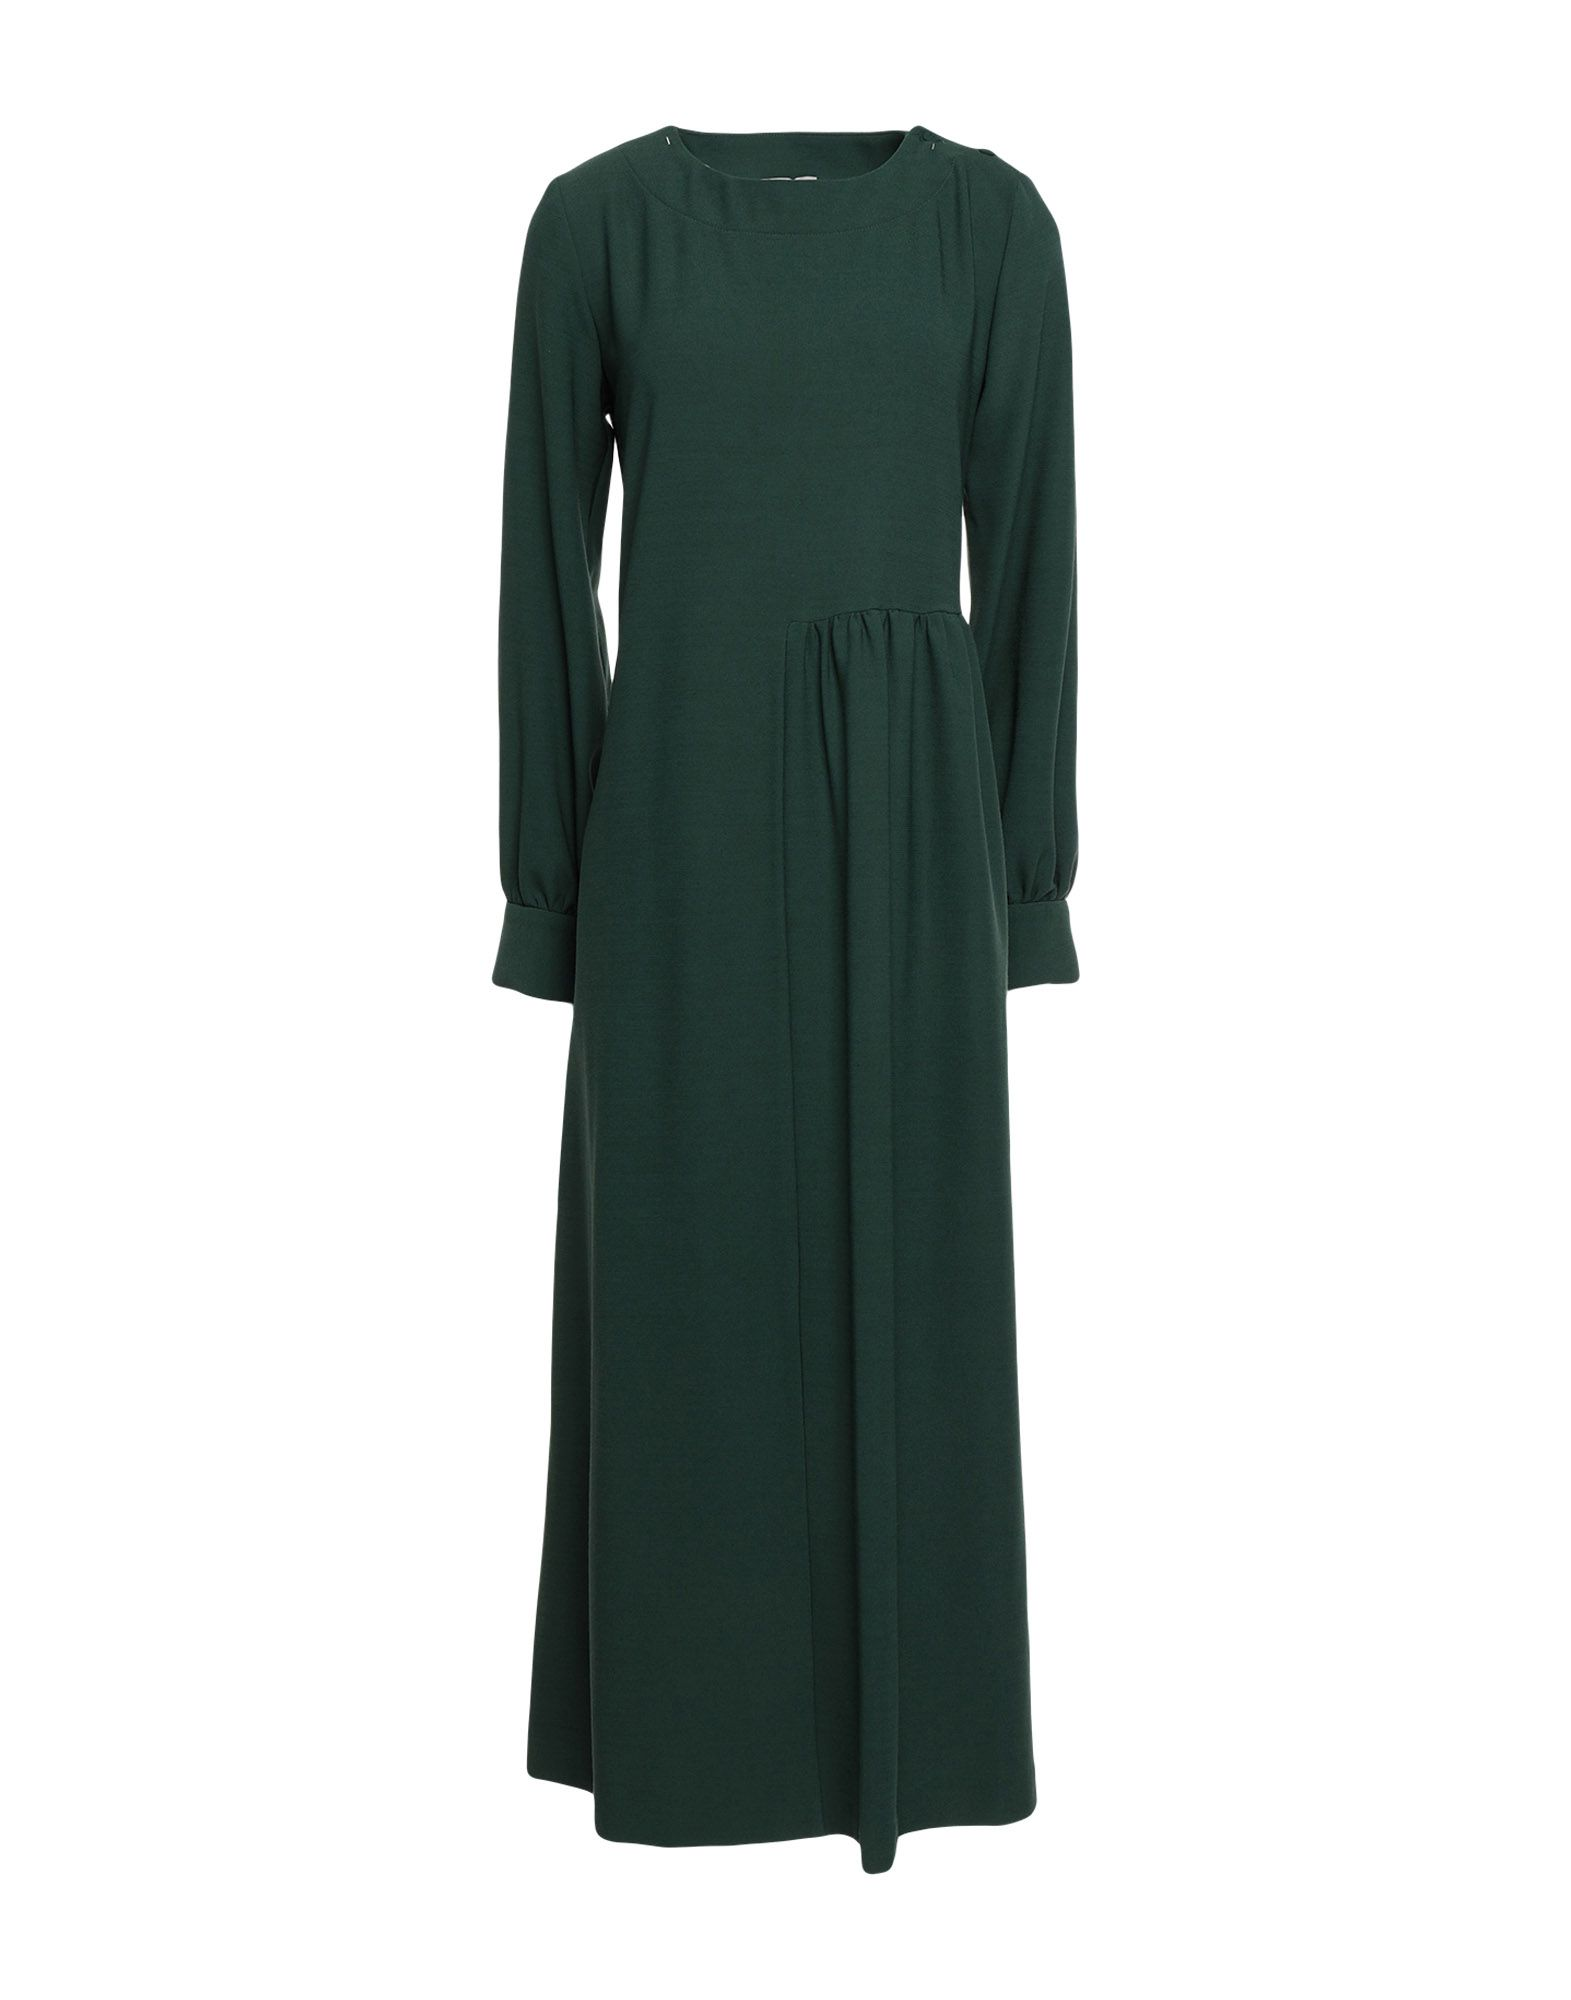 JUPE DE SATIN Платье длиной 3/4 jupe de satin длинное платье